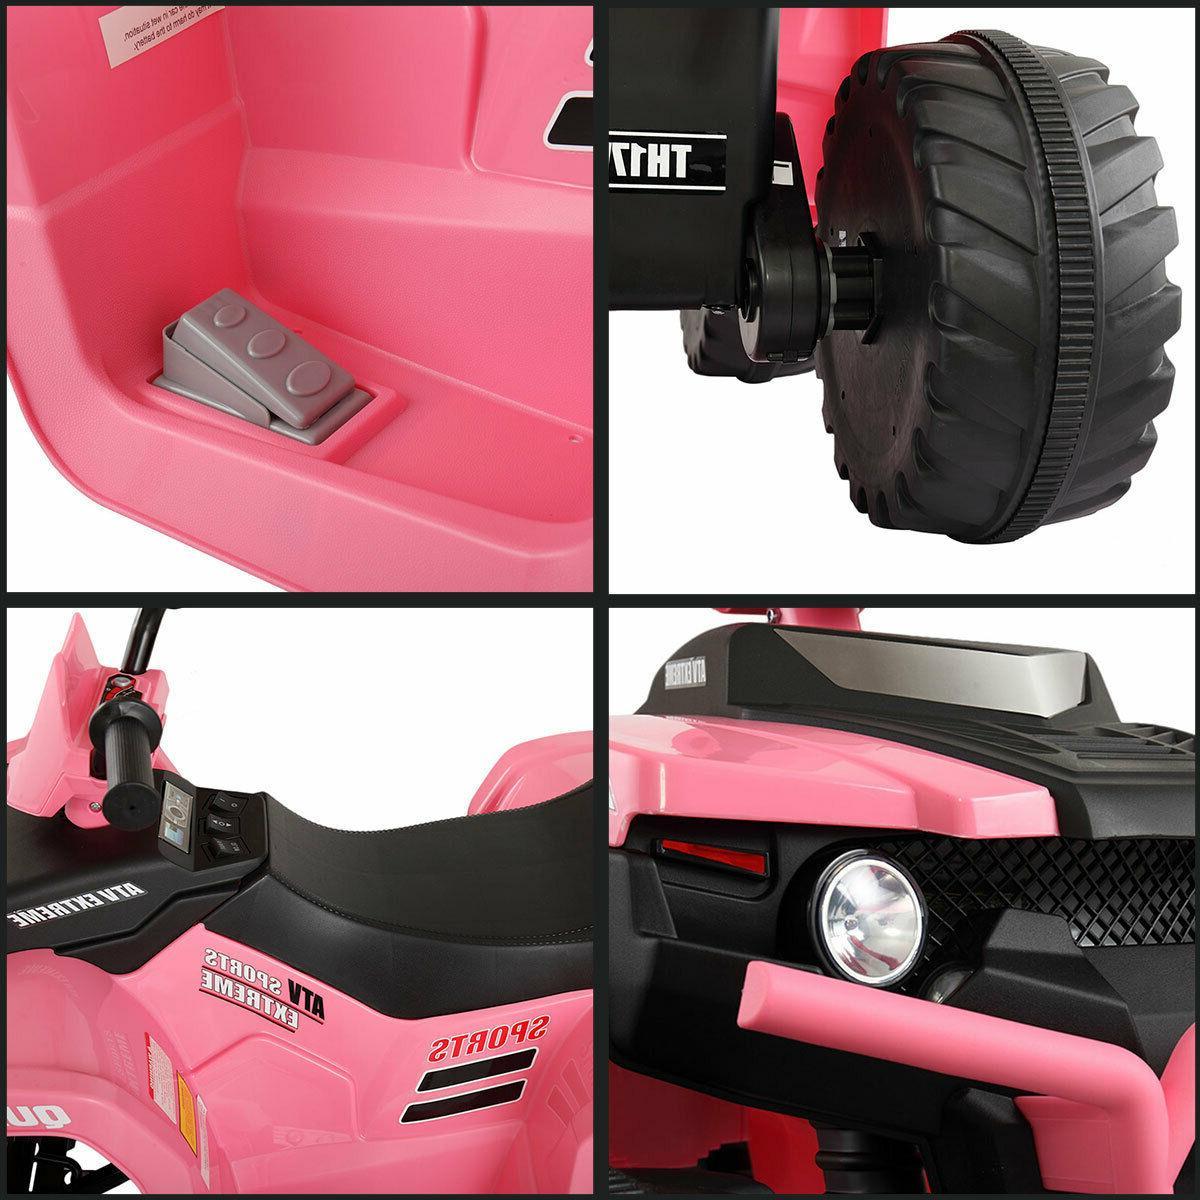 12V Kid Ride On ATV 4 Wheels Powered Car Ride On Toy W/ Music